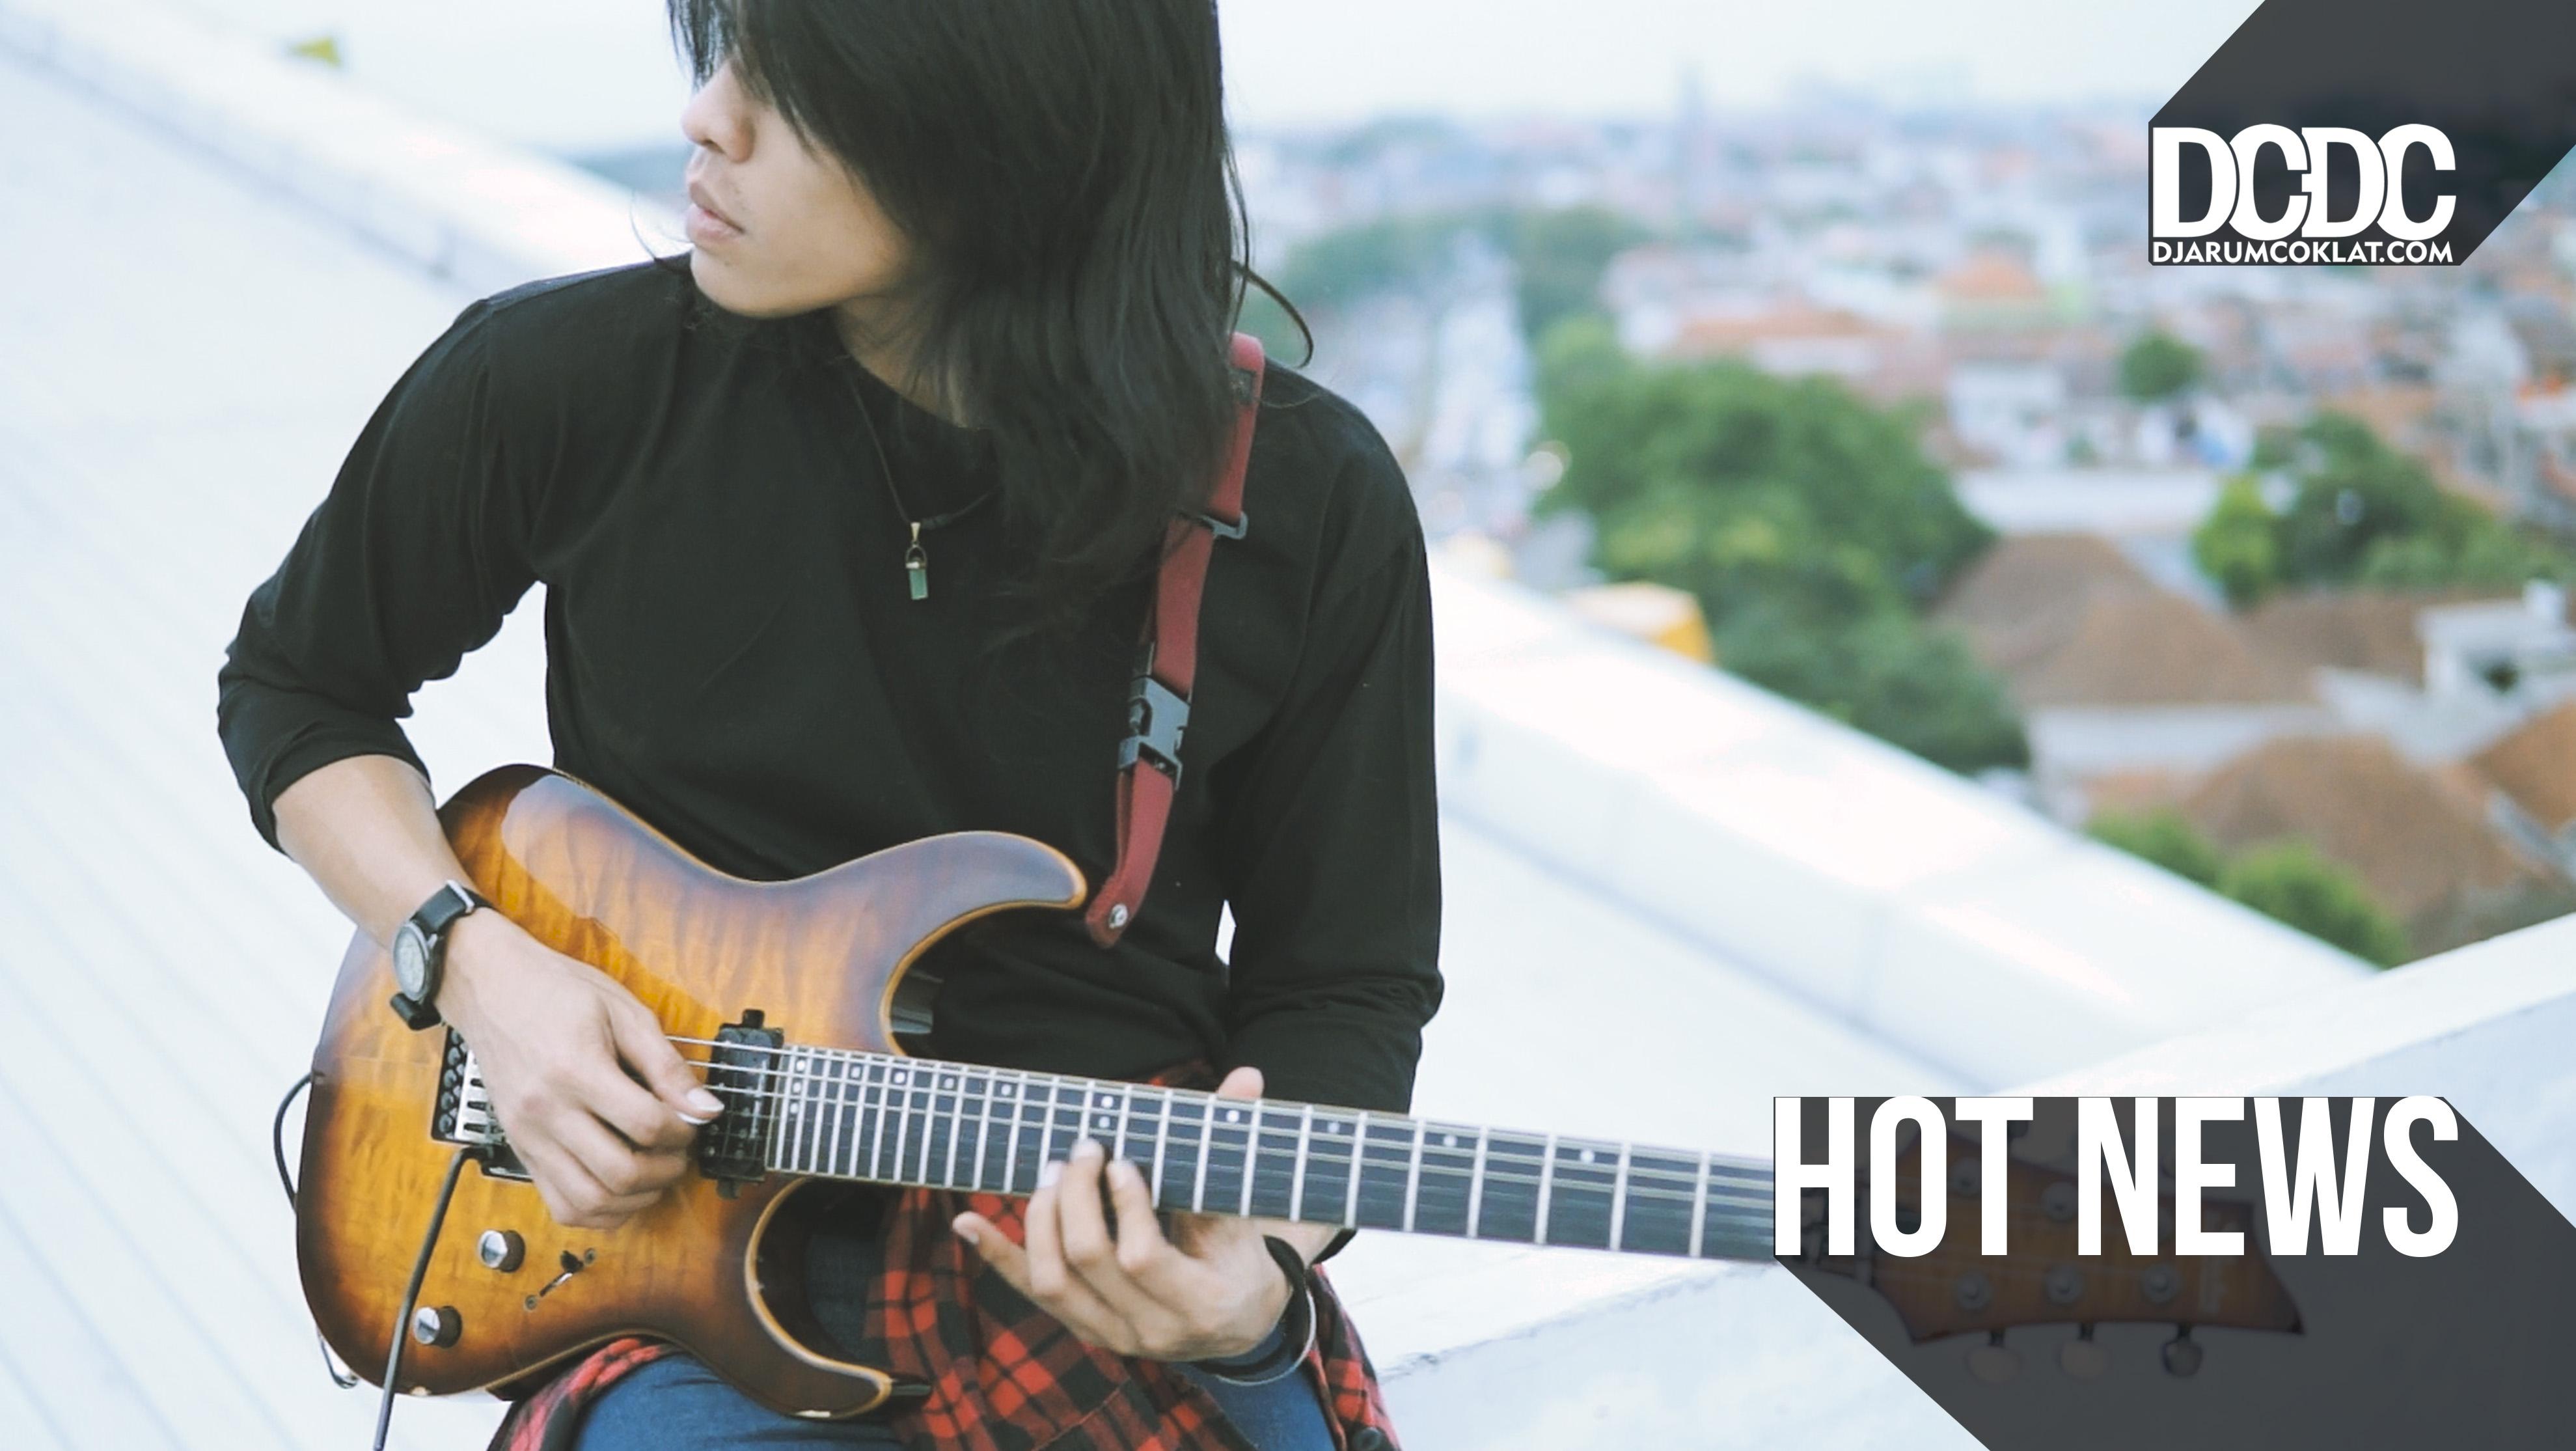 Tayang Perdana, Video Klip